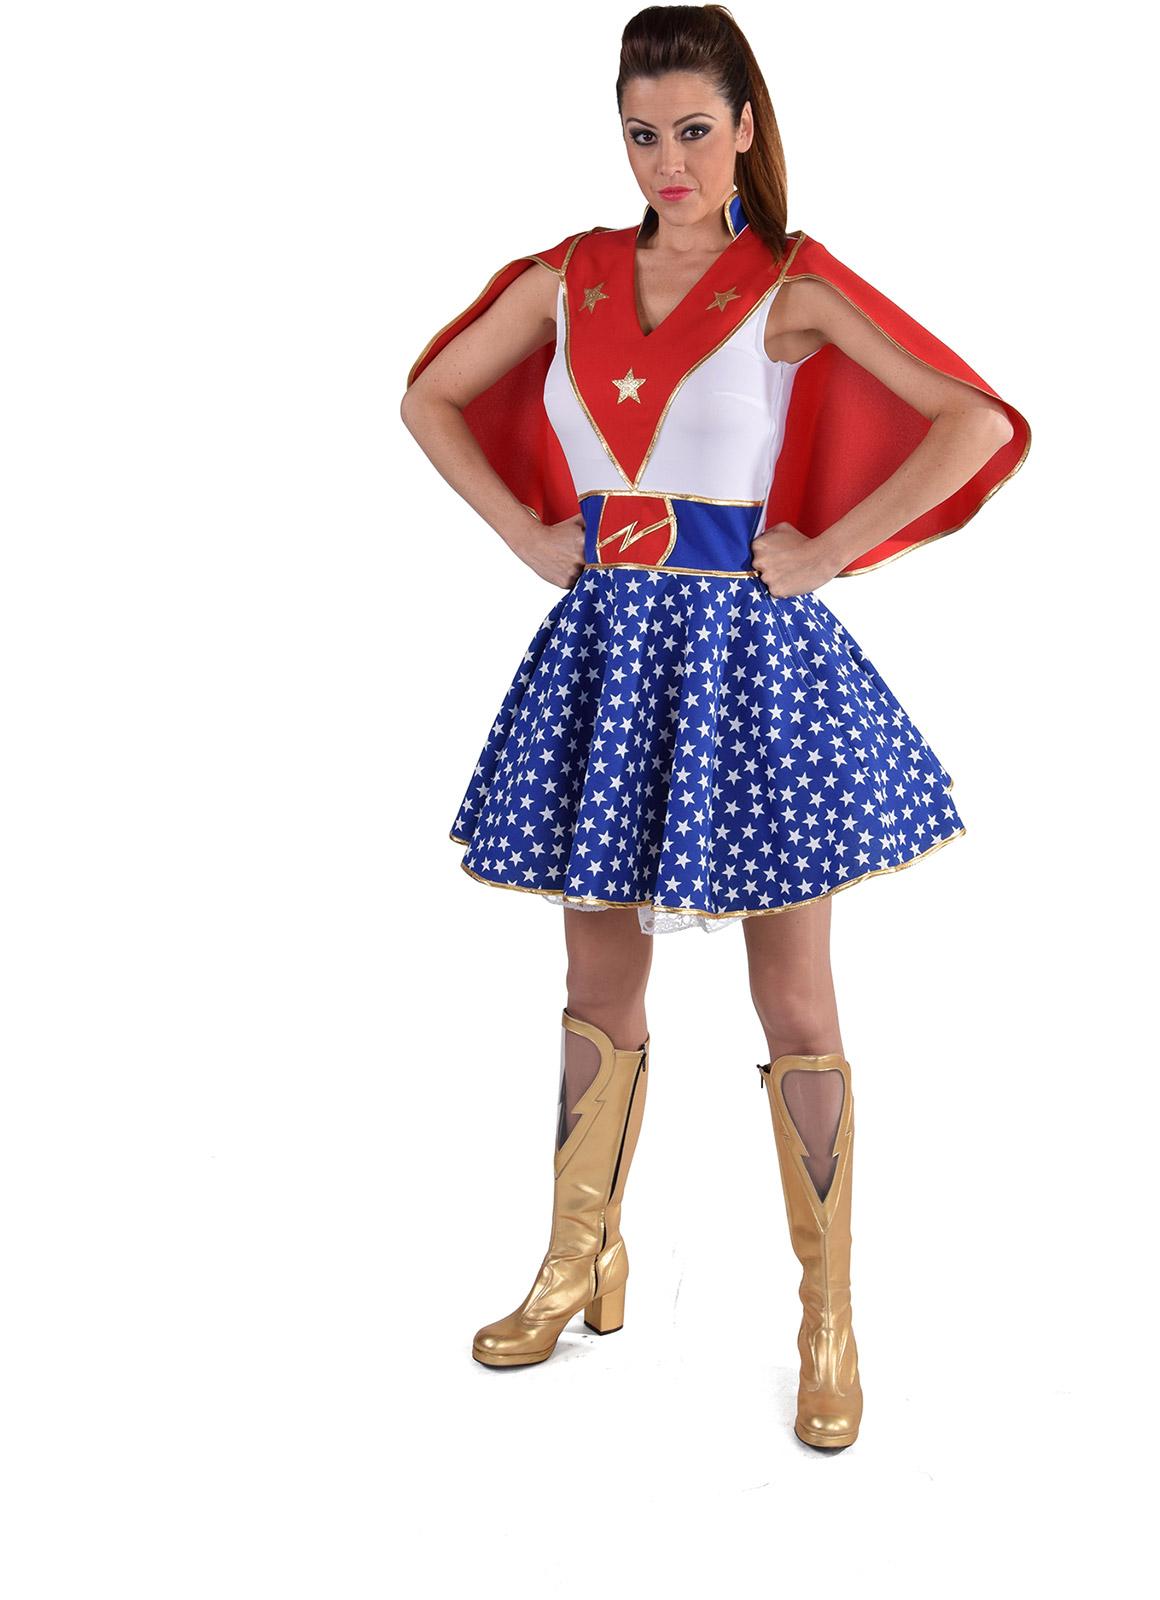 Wondergirl / Super Girl